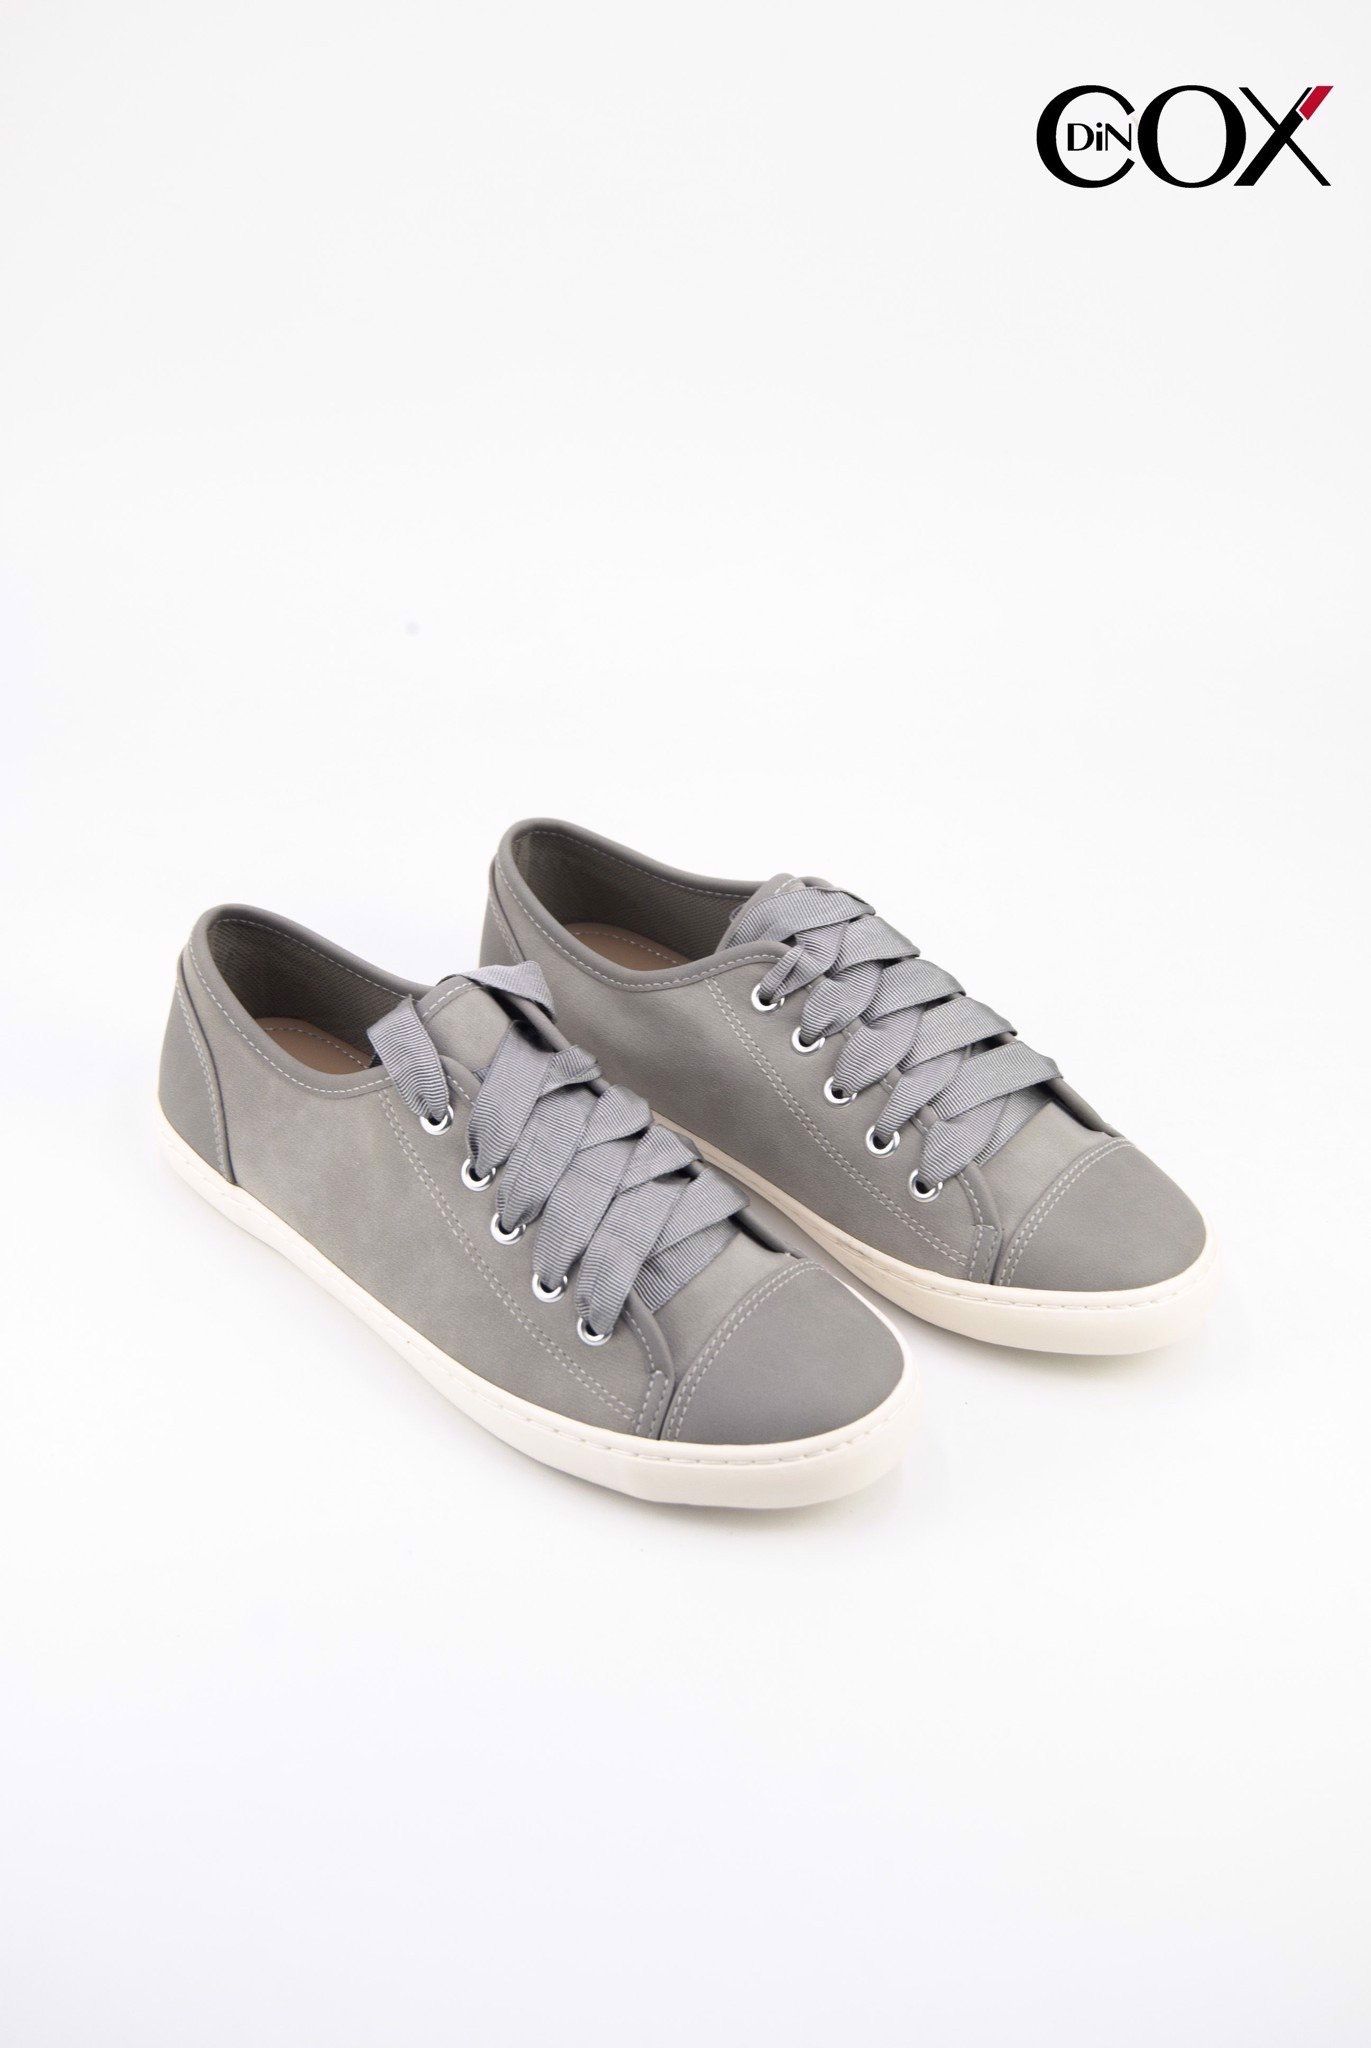 dincox3723-grey